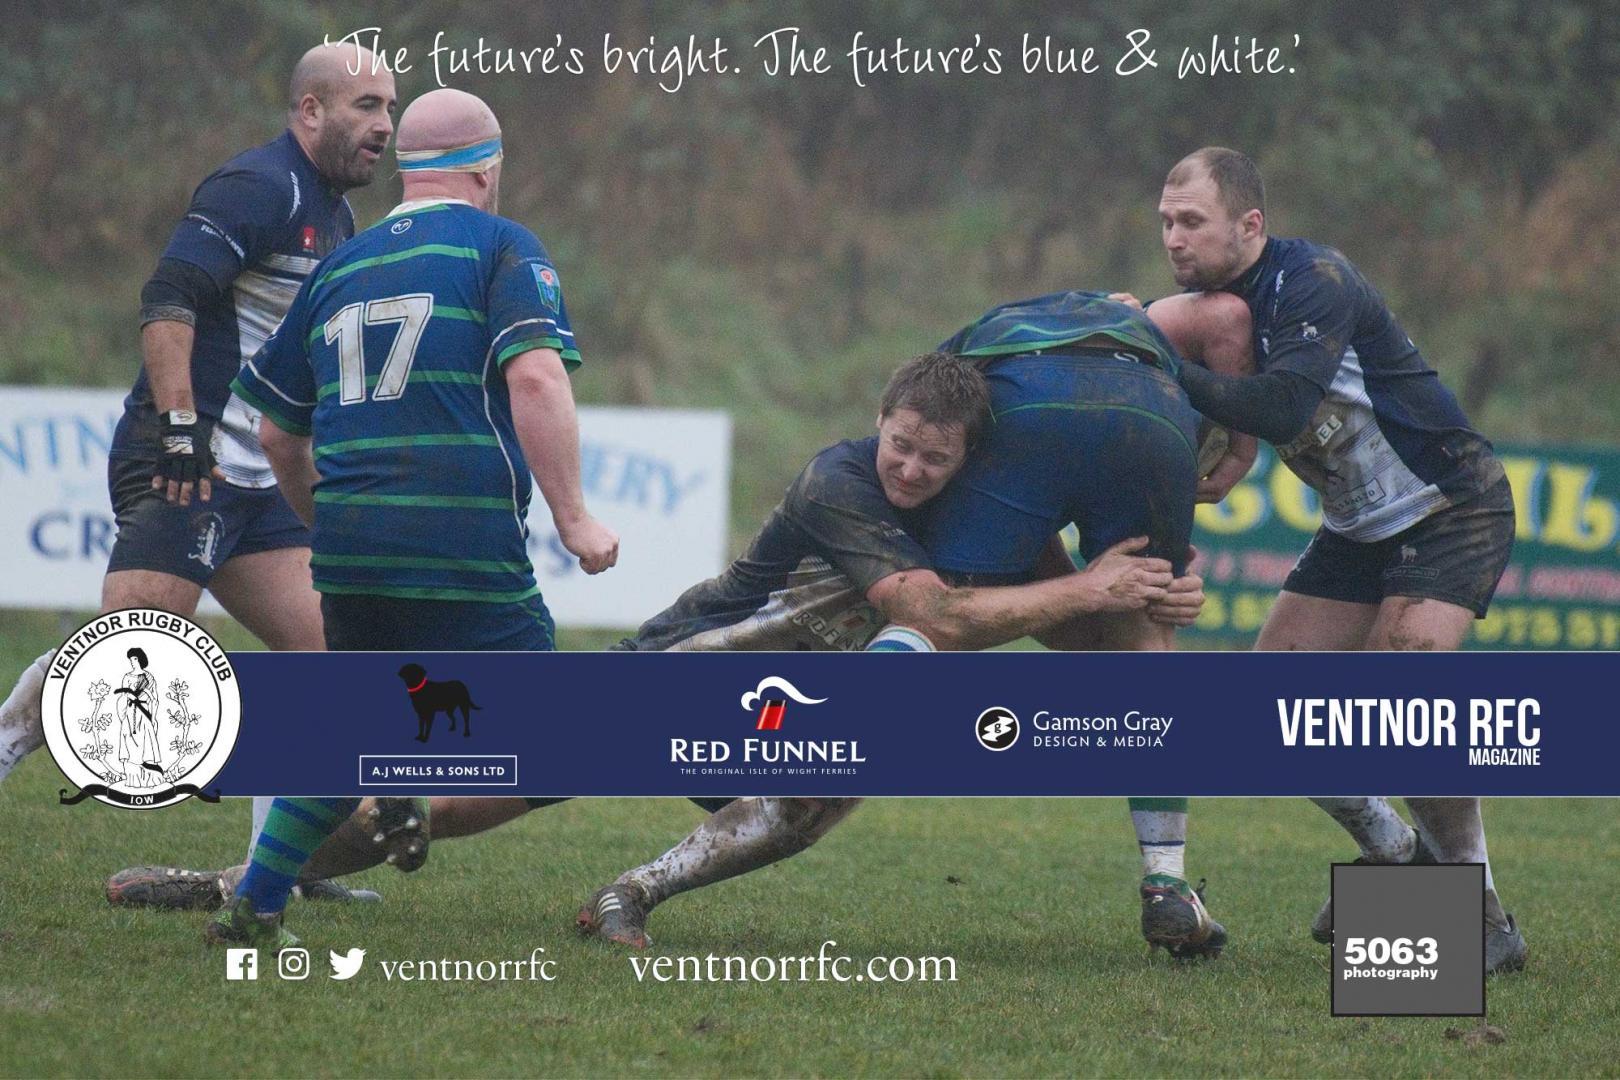 Match report: Ventnor RFC 1XV v Overton RFC 1XV, 1 December 2018